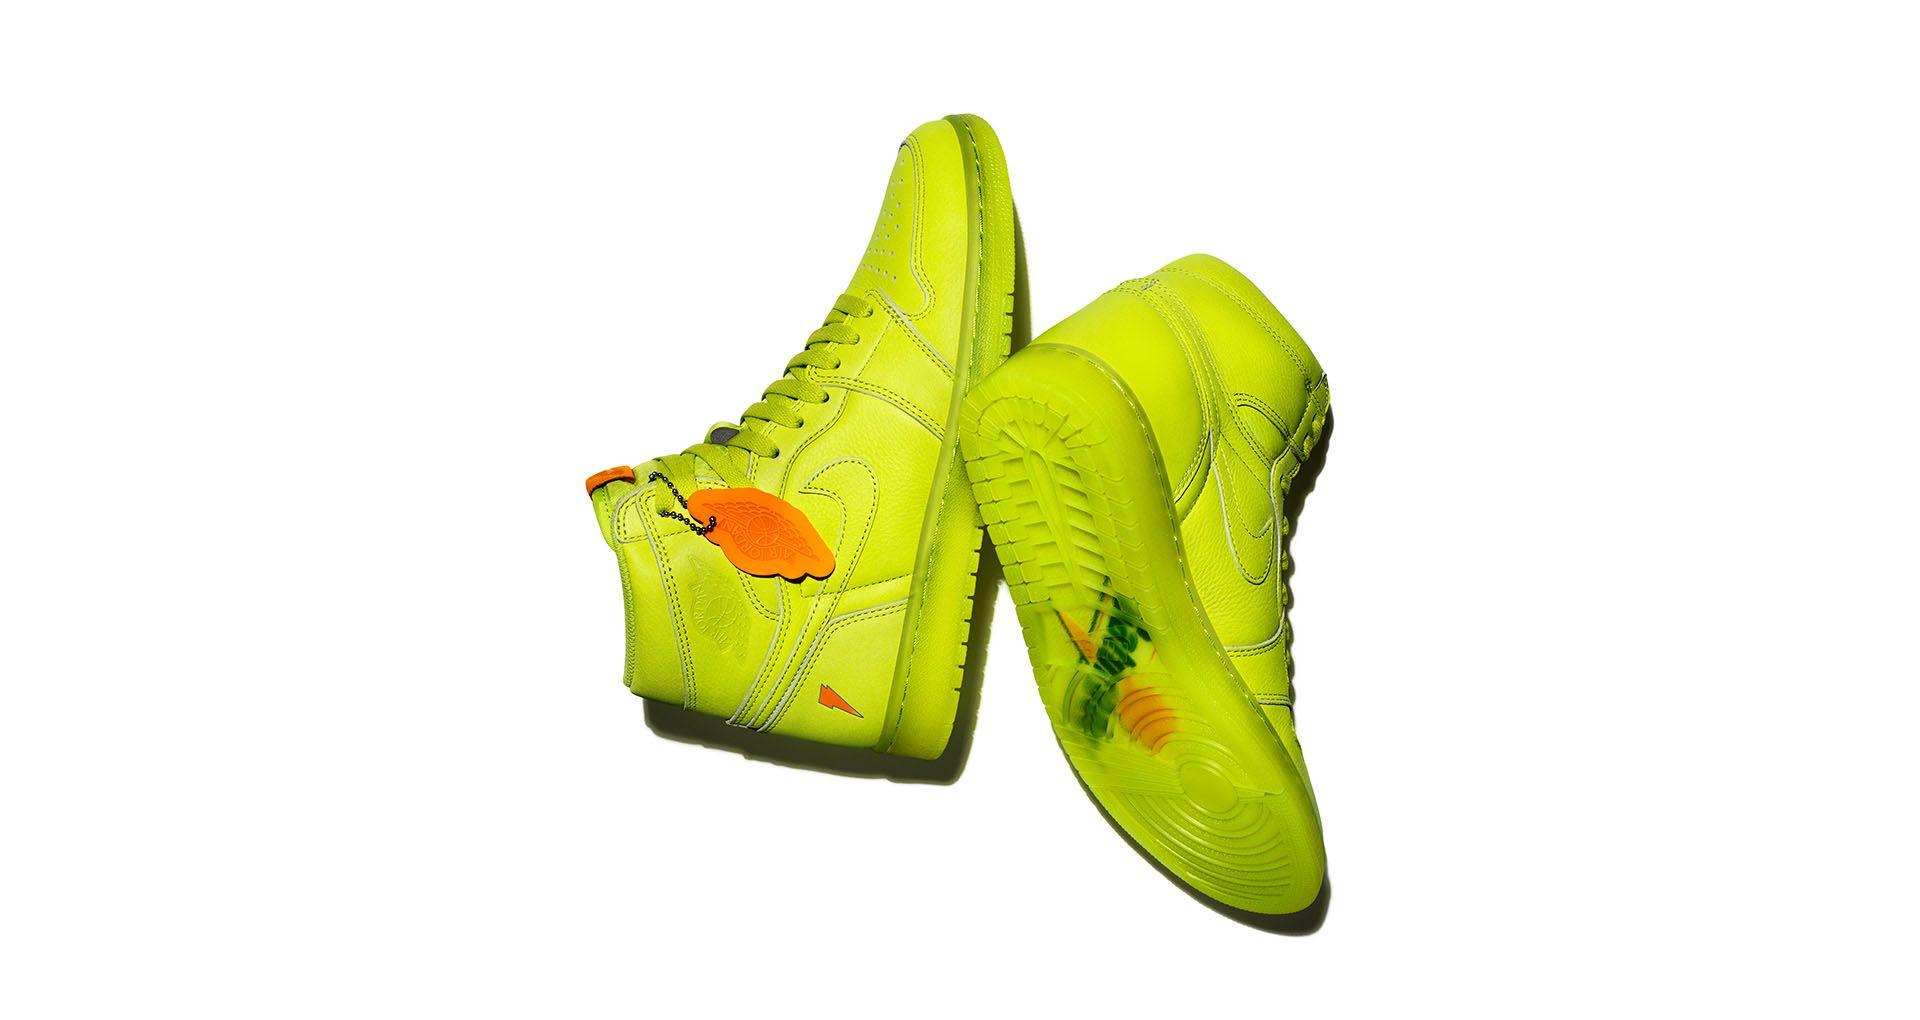 1d2fb9101f49 Air Jordan 1 High Gatorade  Lemon-Lime  Release Date. Nike+ SNKRS